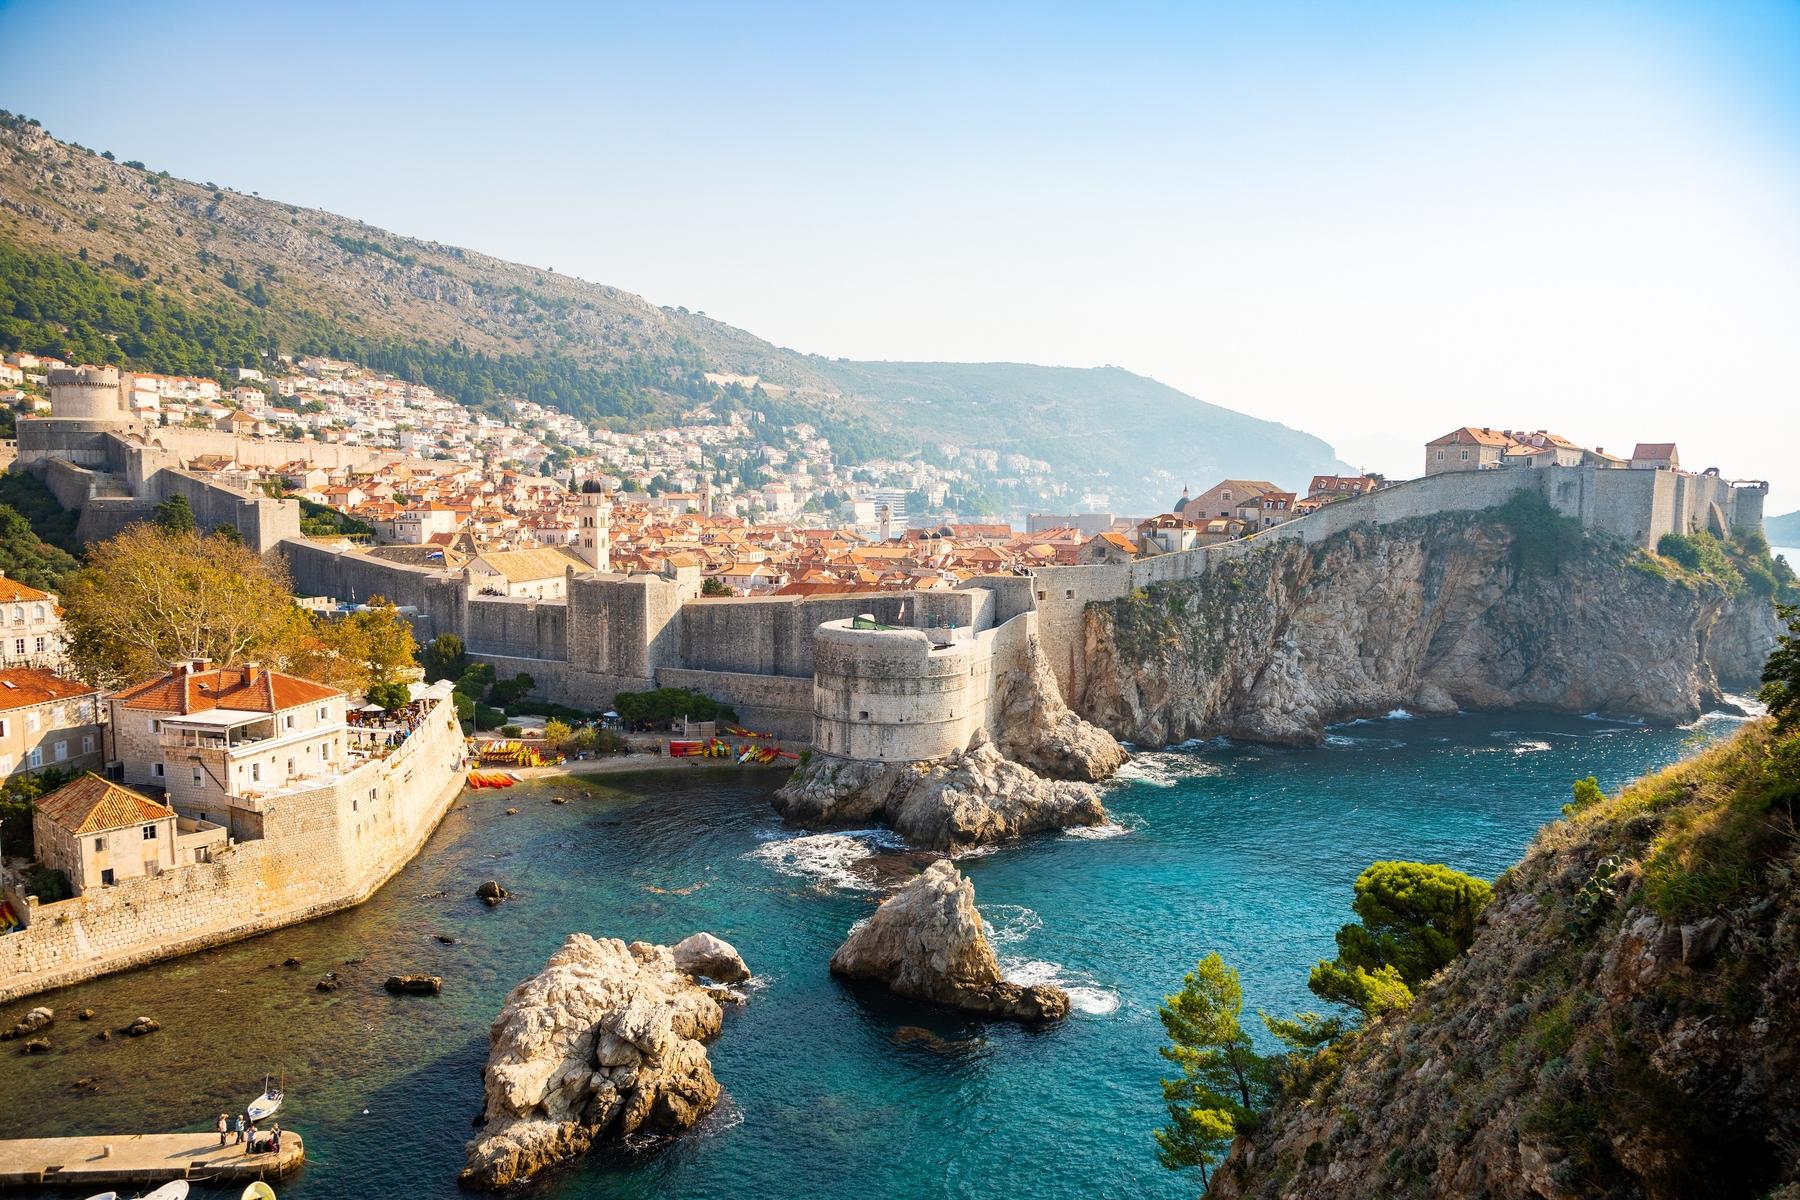 Dubrovnik, in Croatia, is great in September